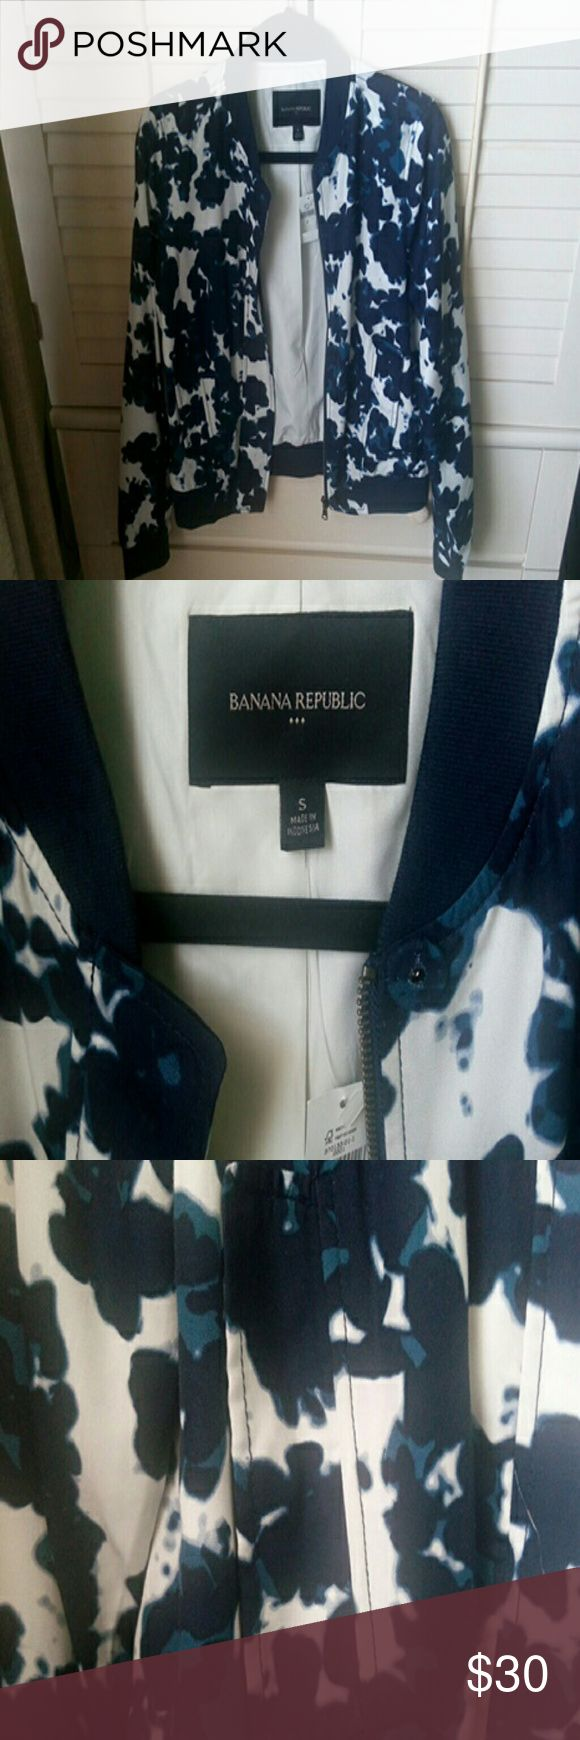 Banana Republic bomber jacket new with tags Blue and white print Banana Republic Jackets & Coats Utility Jackets